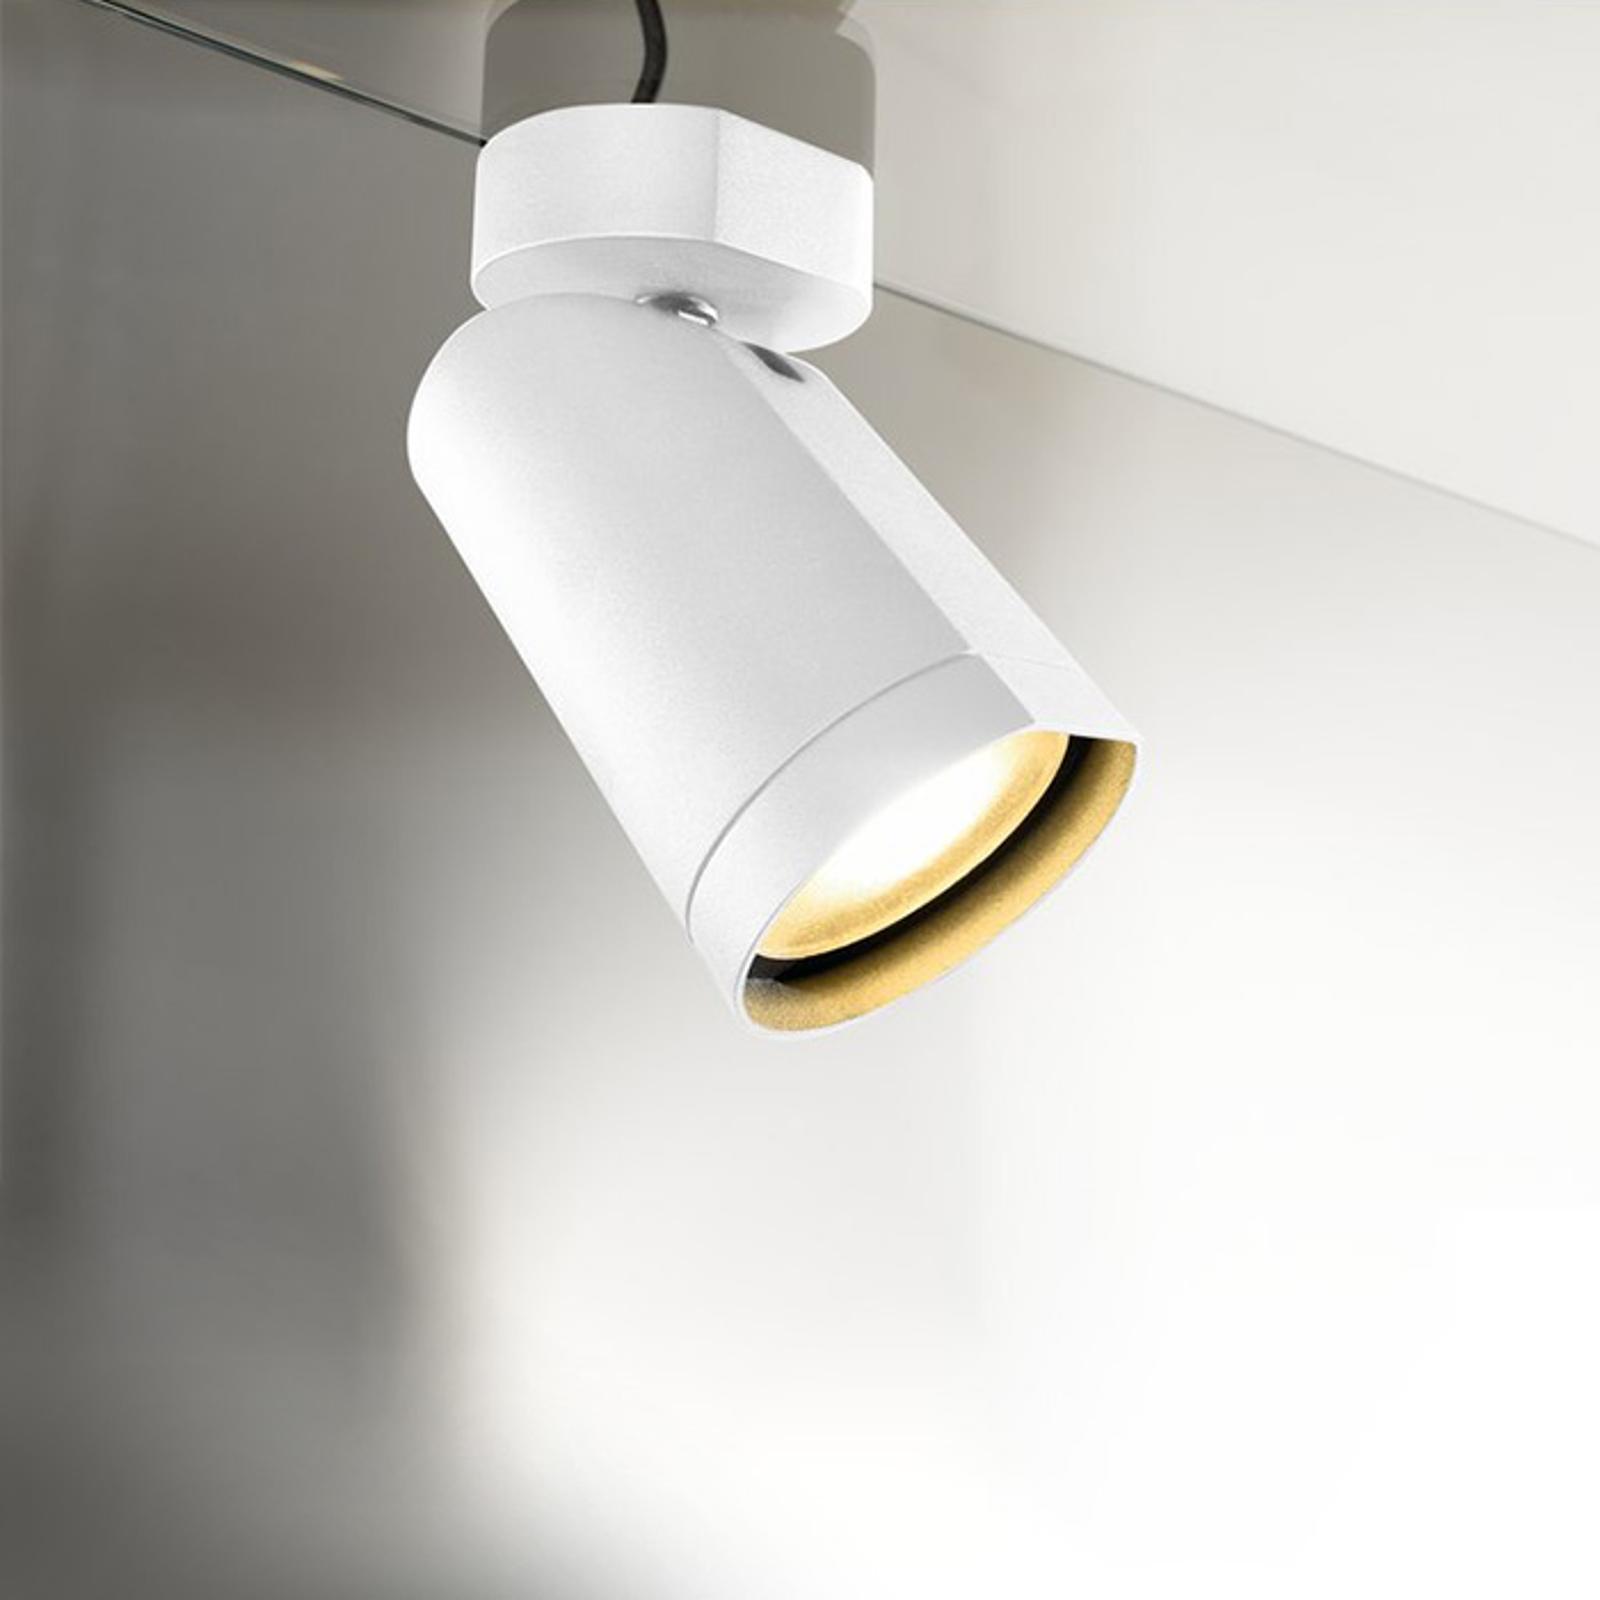 SLV Bilas one-bulb LED spotlight, white_5504643_1